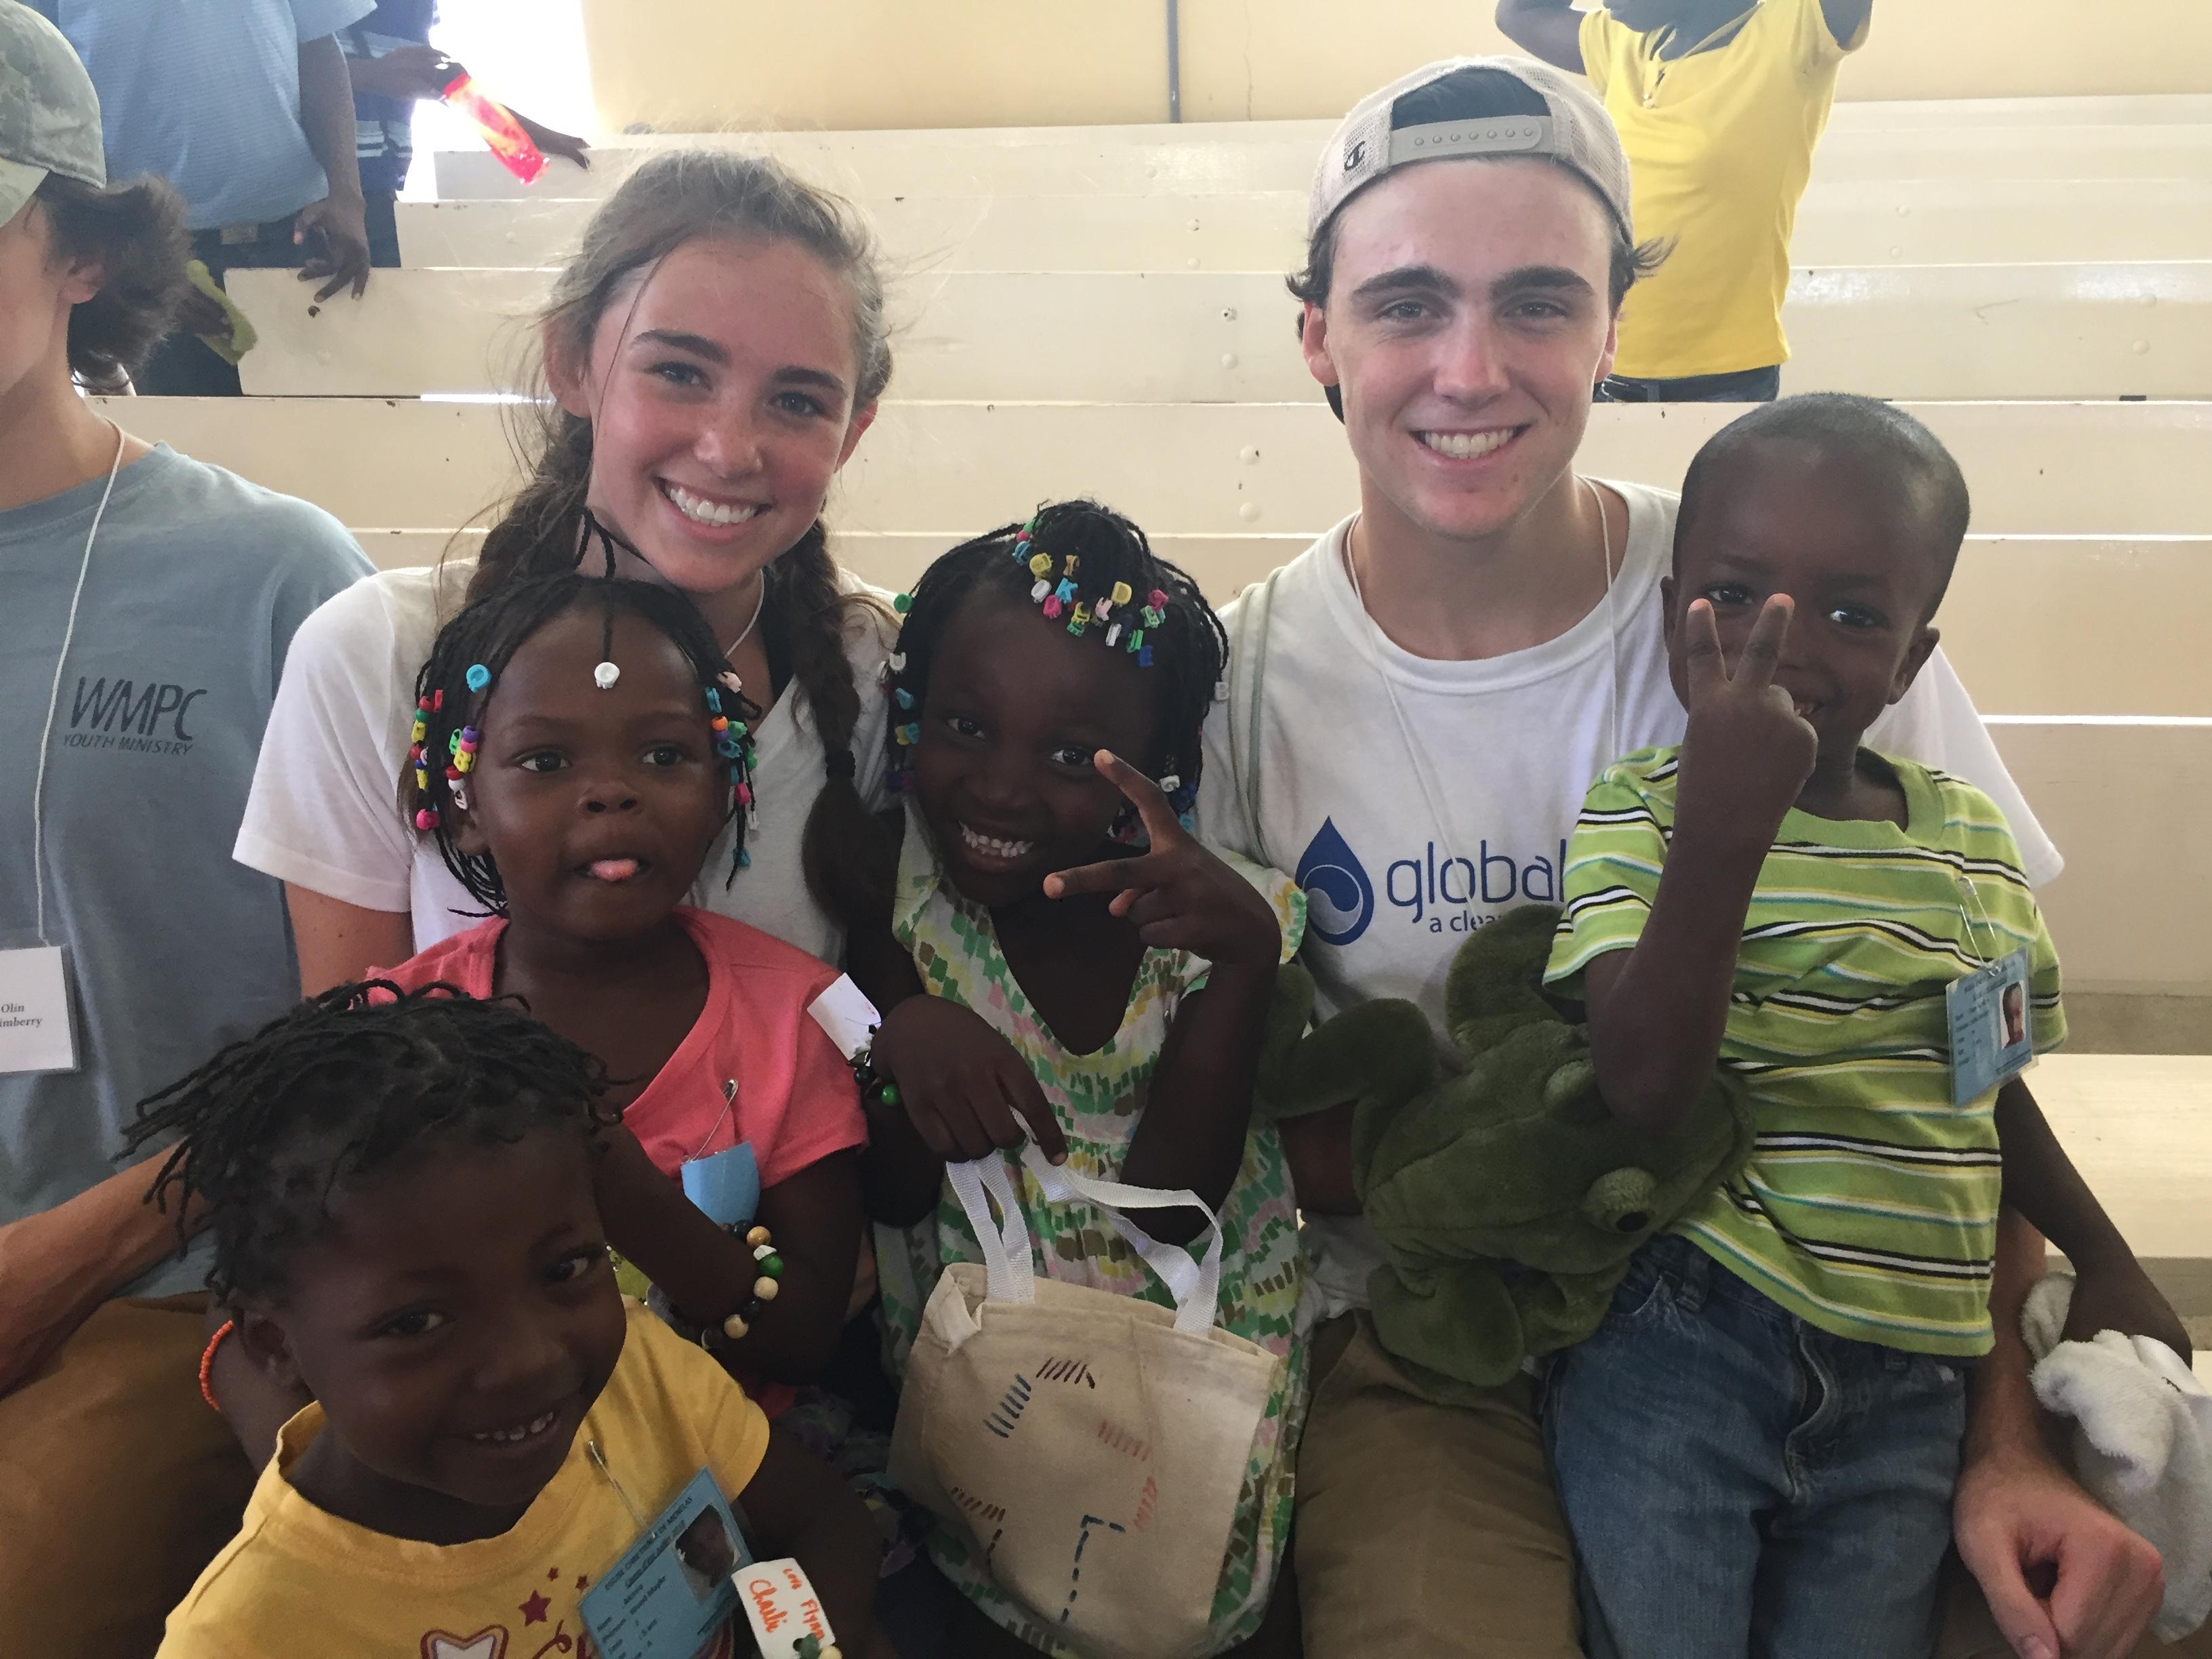 <div class='meta'><div class='origin-logo' data-origin='none'></div><span class='caption-text' data-credit='Credit: Margaret Johnston'>White Memorial Presbyterian Church's trip to Haiti</span></div>